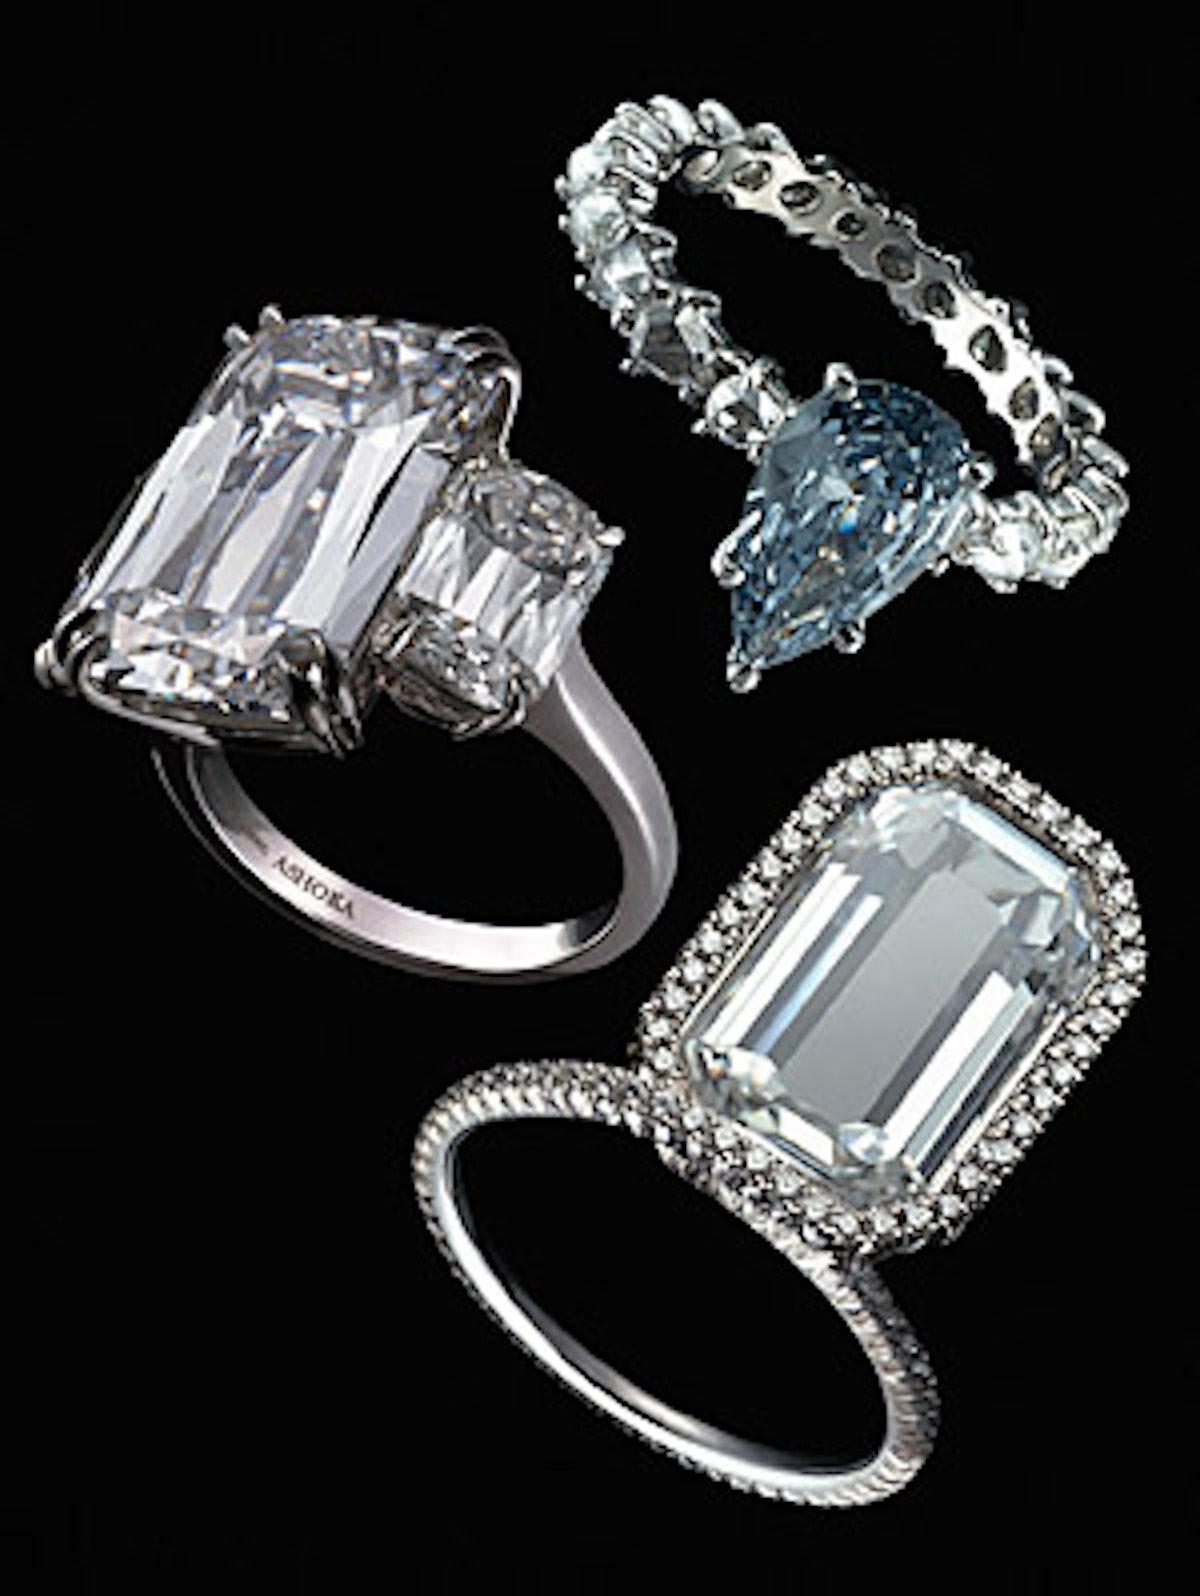 acss_diamonds_03_v.jpg